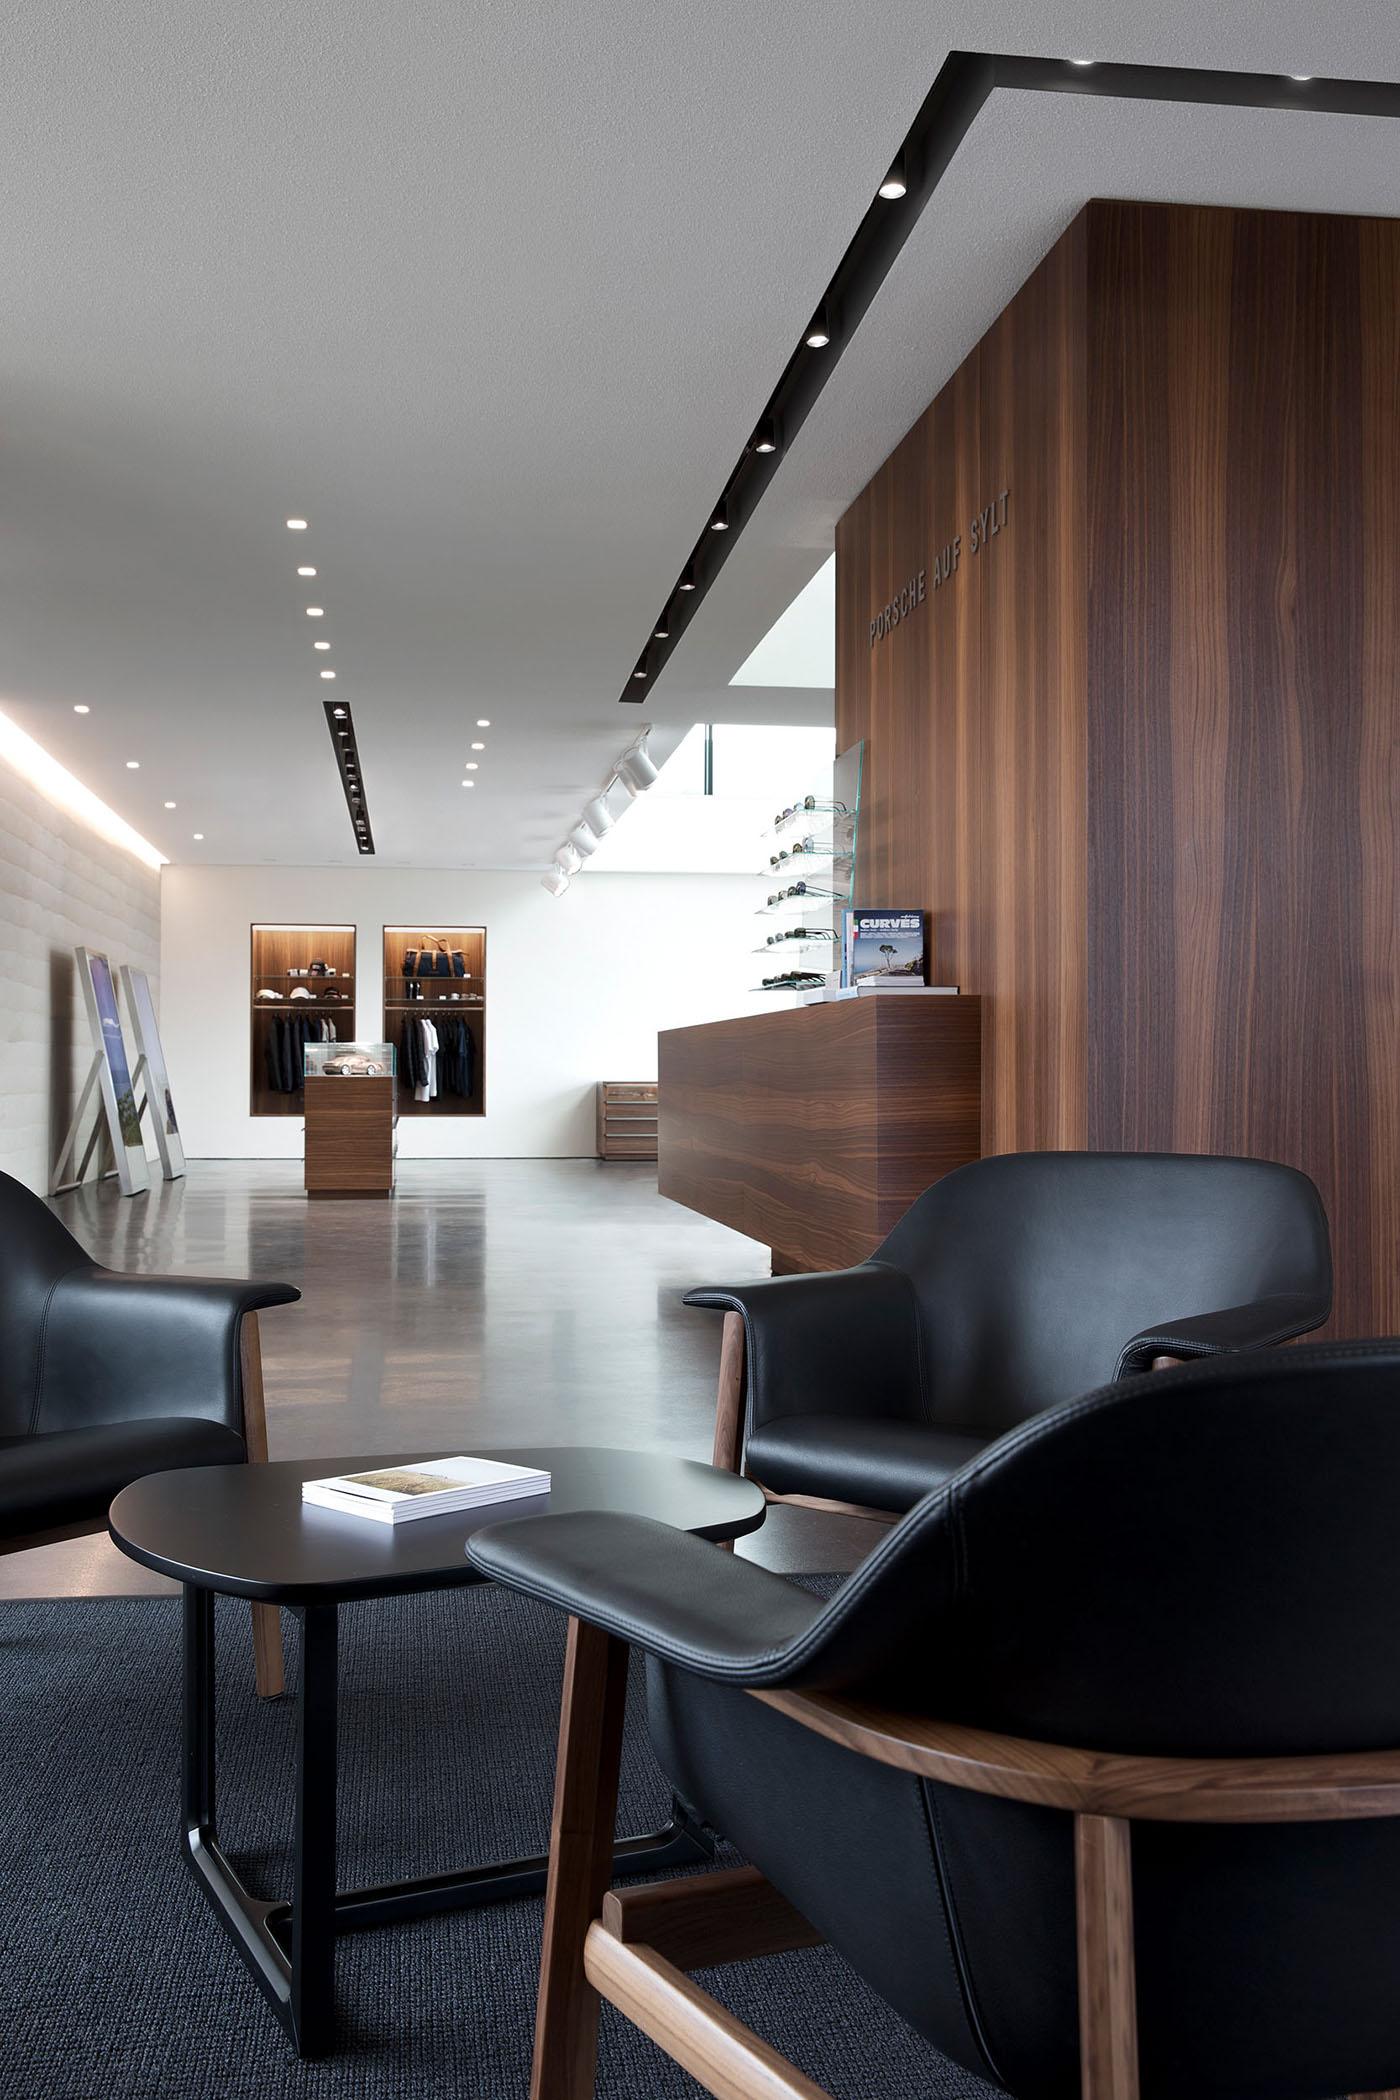 RETAIL CONCEPT Corporate Design interior design  Utilization concept Imagery Exhibition  tonality furnishings Retail furnishings Communication Design